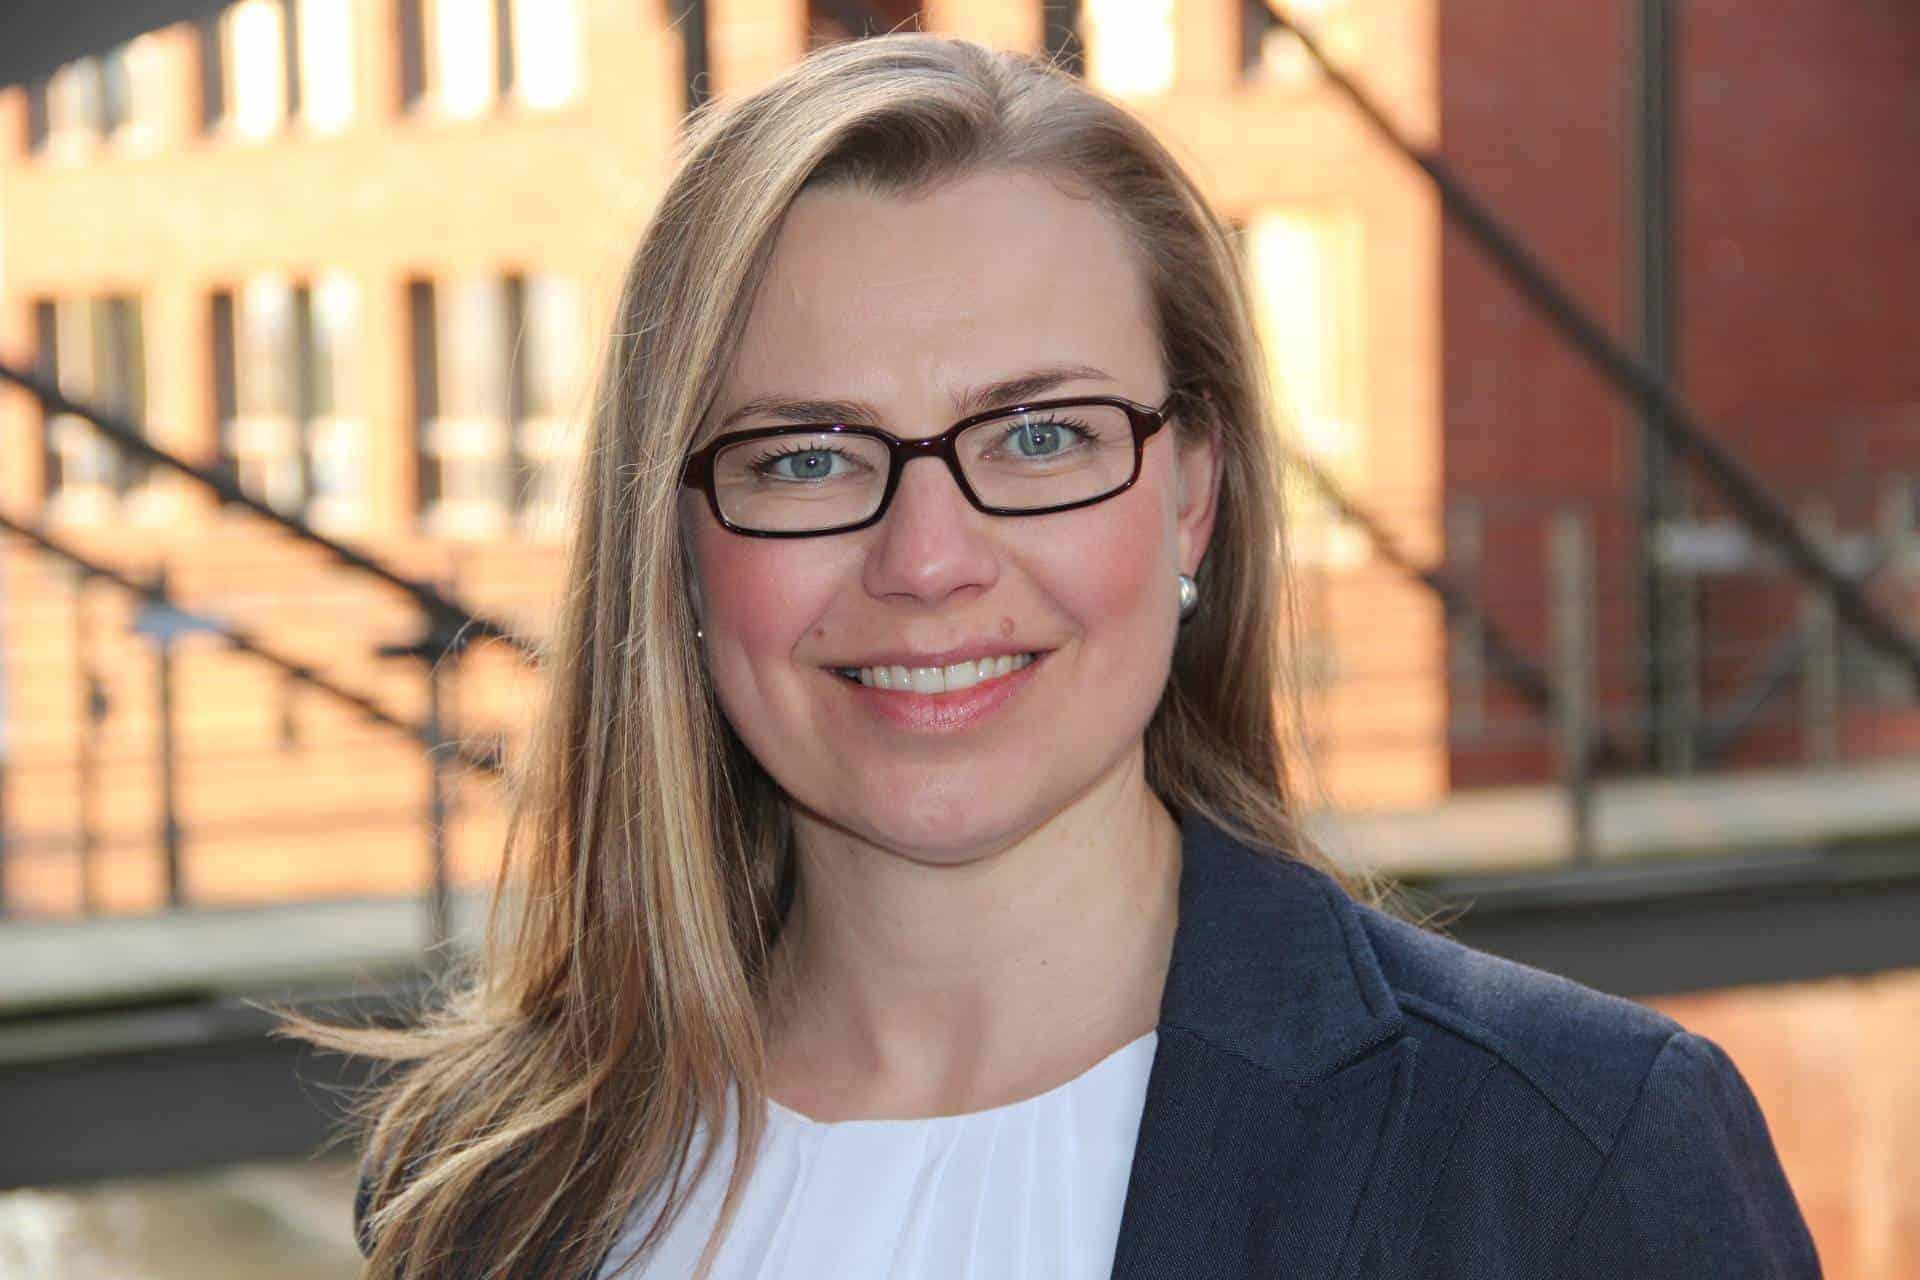 Jenny Gruner: Diese 5 Prinzipien definiert Hapag-Lloyd als Erfolgsfaktor